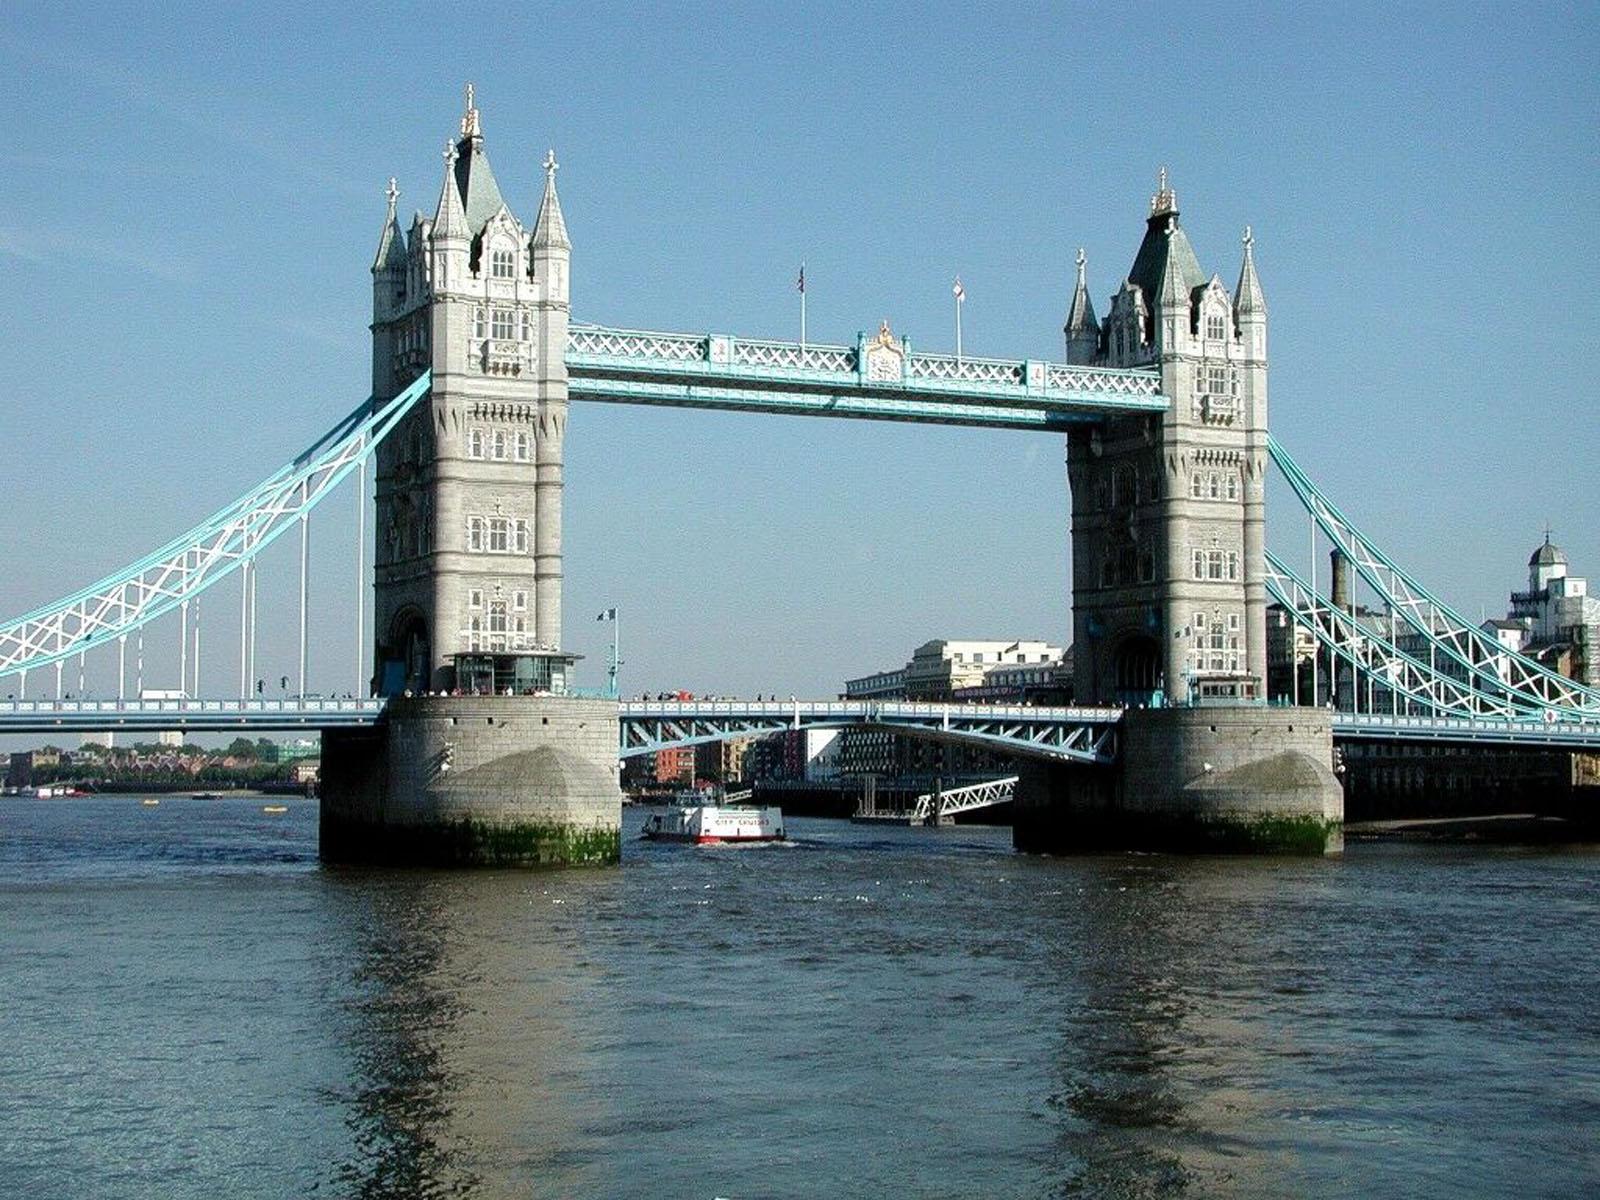 wallpapers tower bridge london wallpapers gb london tower bridge jpg 1600x1200